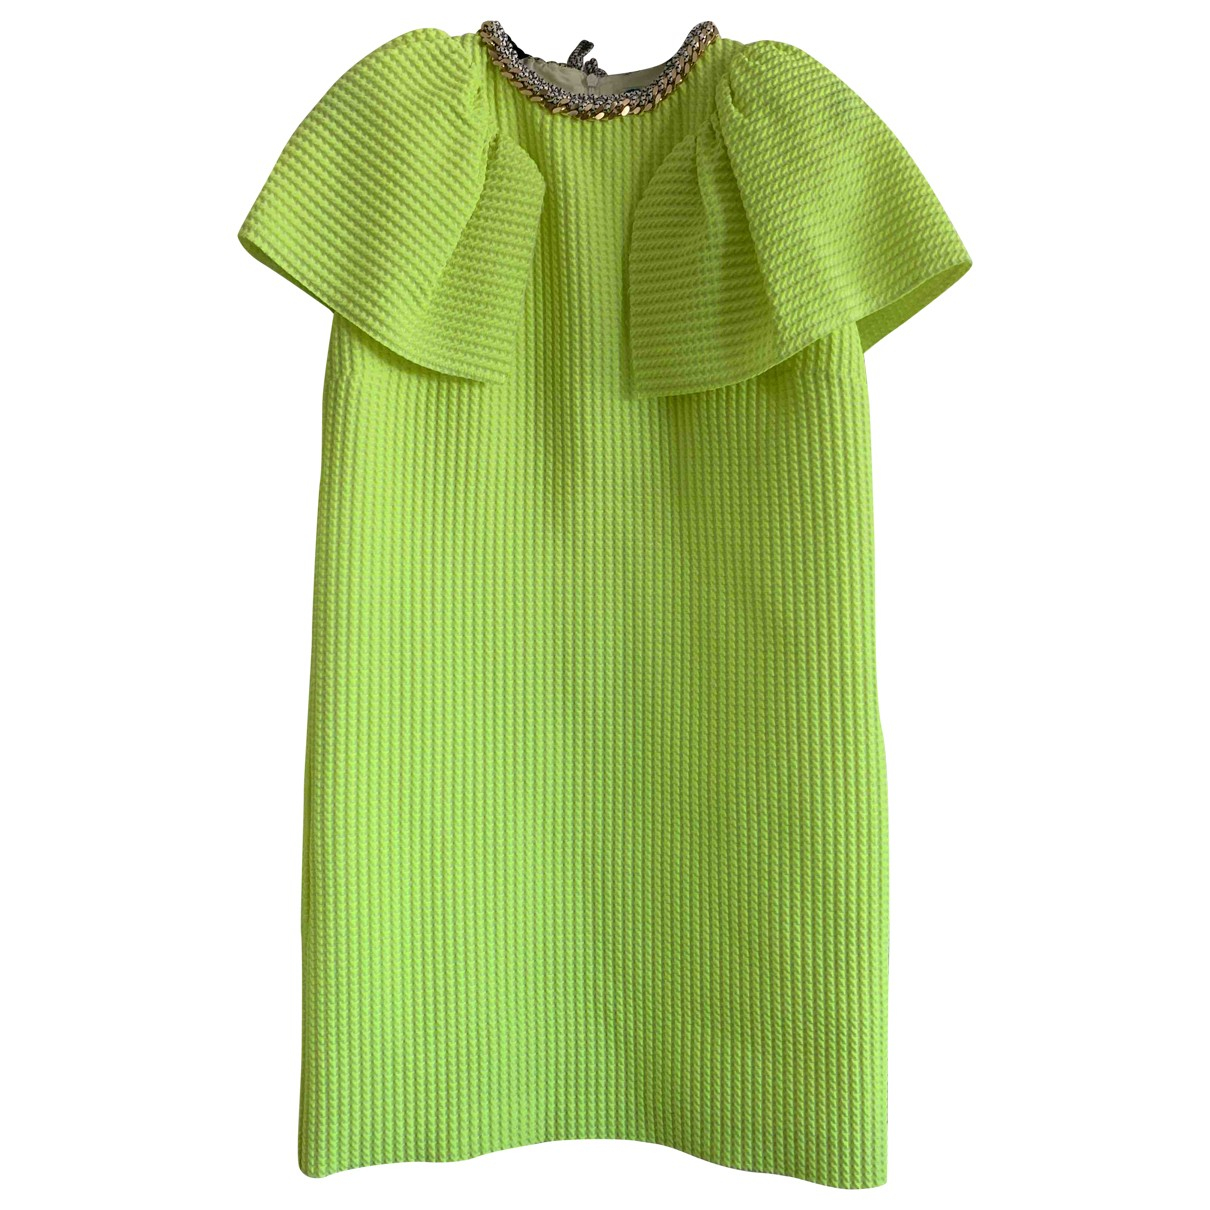 Msgm \N Green dress for Women 40 IT